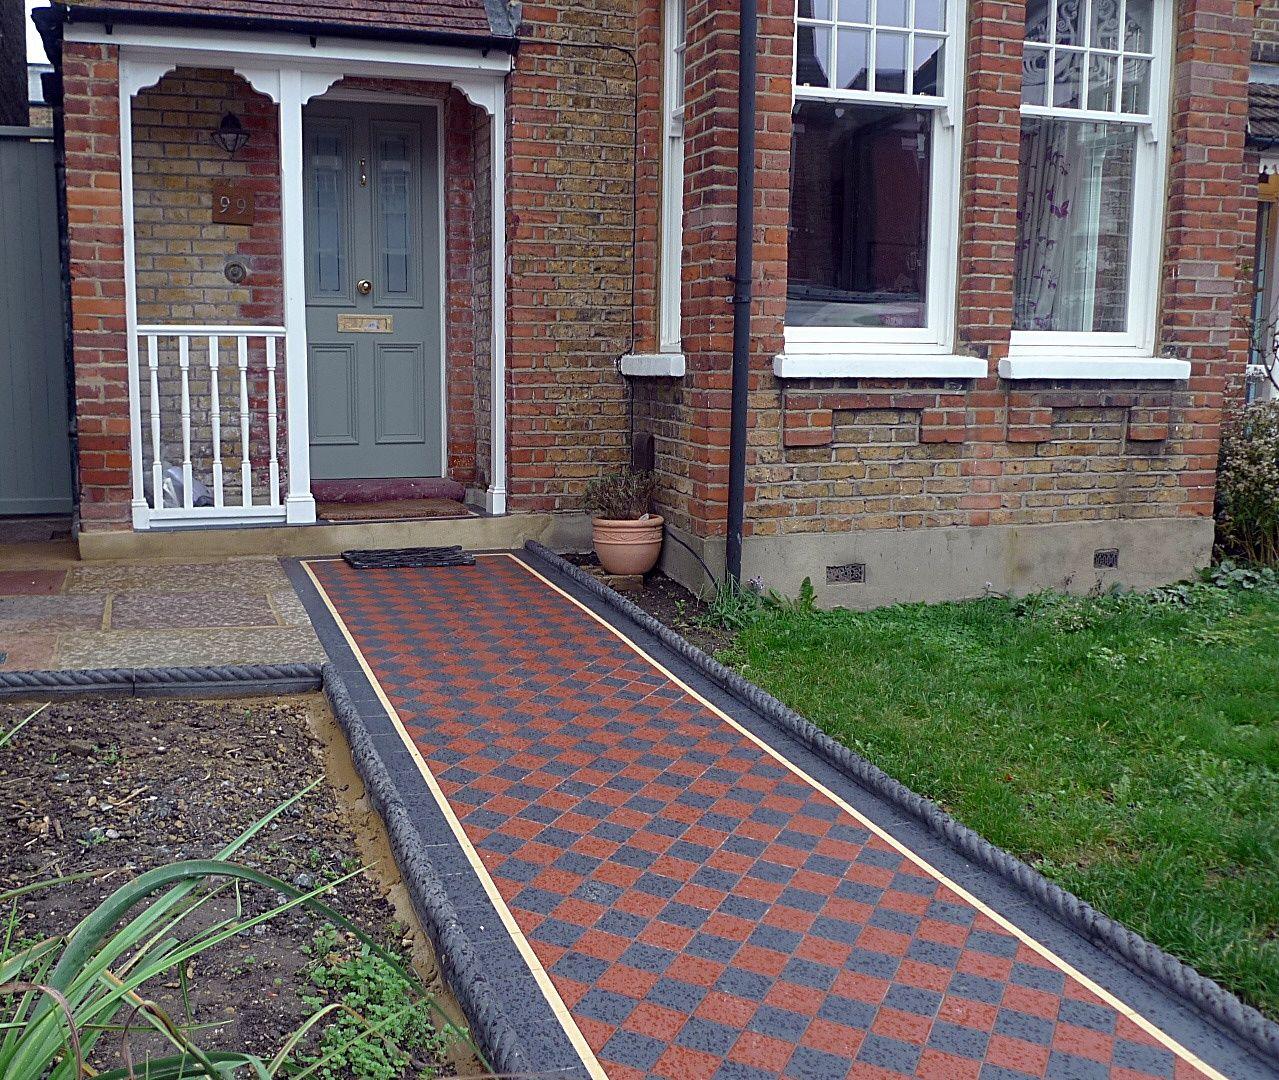 Ornamental Stone Victorian Mosaic Multi Colour Mosaic Charcoal Rope Edge  Tiles Metal Rail Metal Gate York